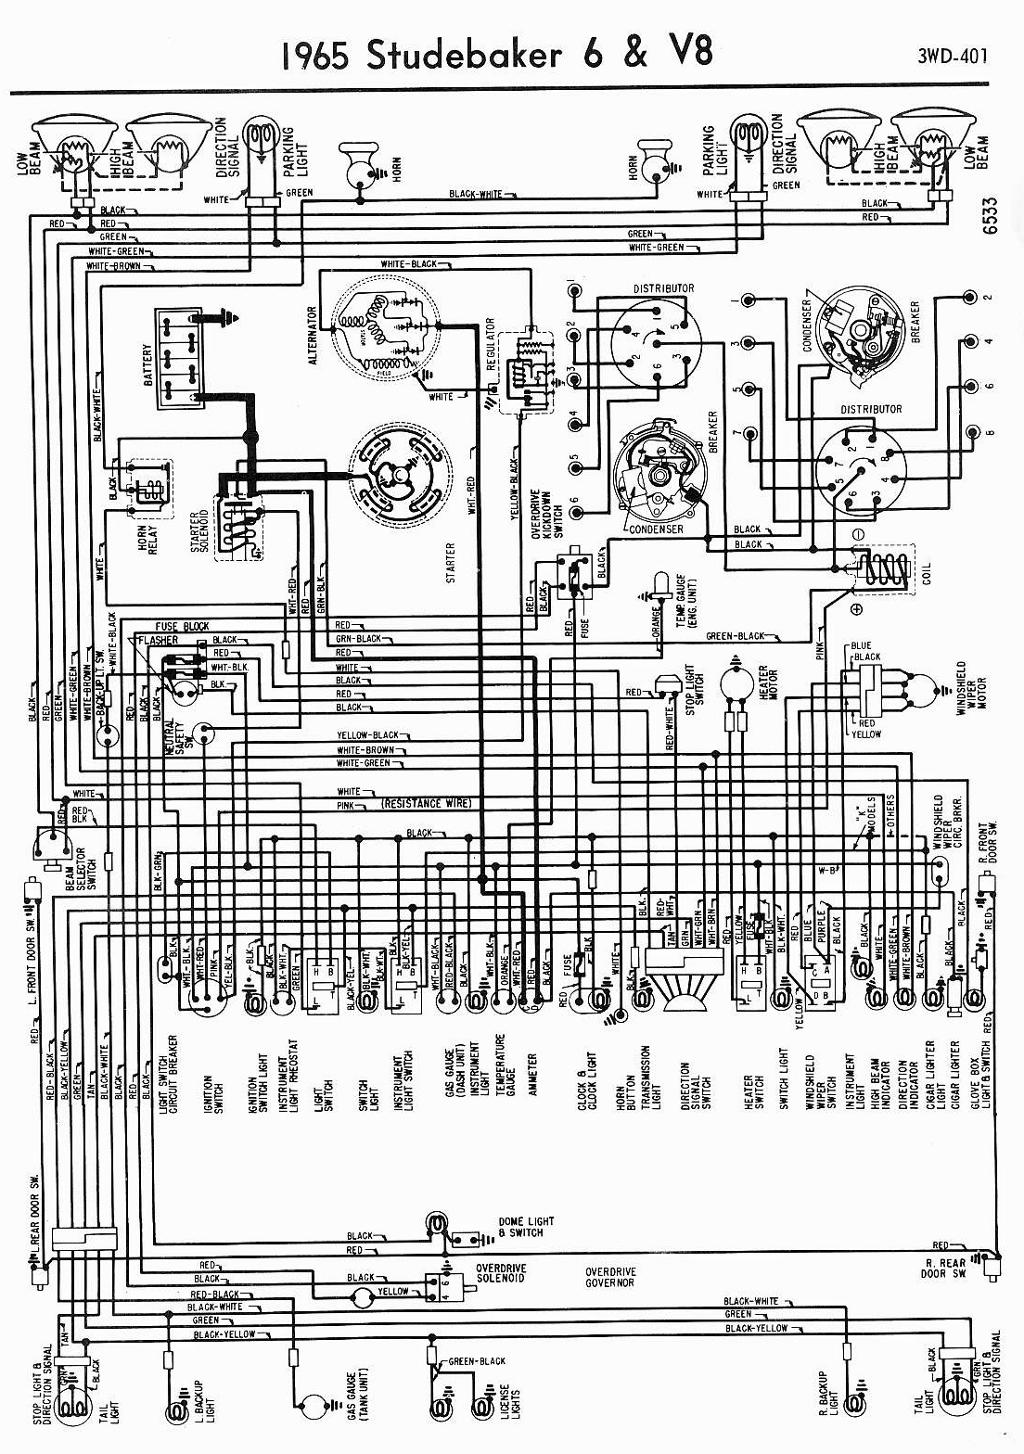 Studebaker Wiring Diagrams 1950 Champion Schematic 1955 Ford Customline Diagram E7 Find U2022